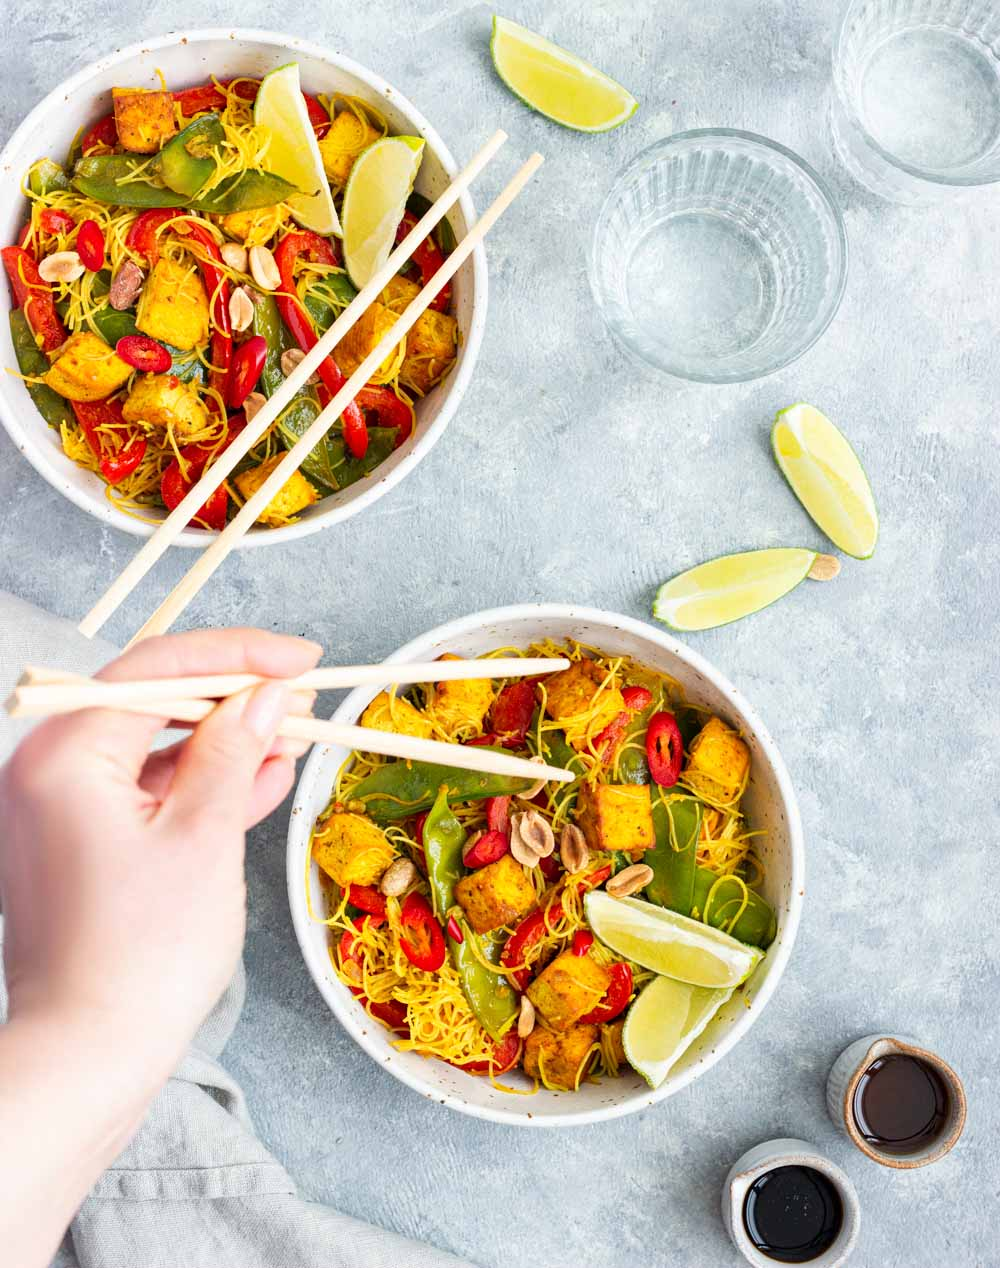 Vegan Singapore noodles with tofu.